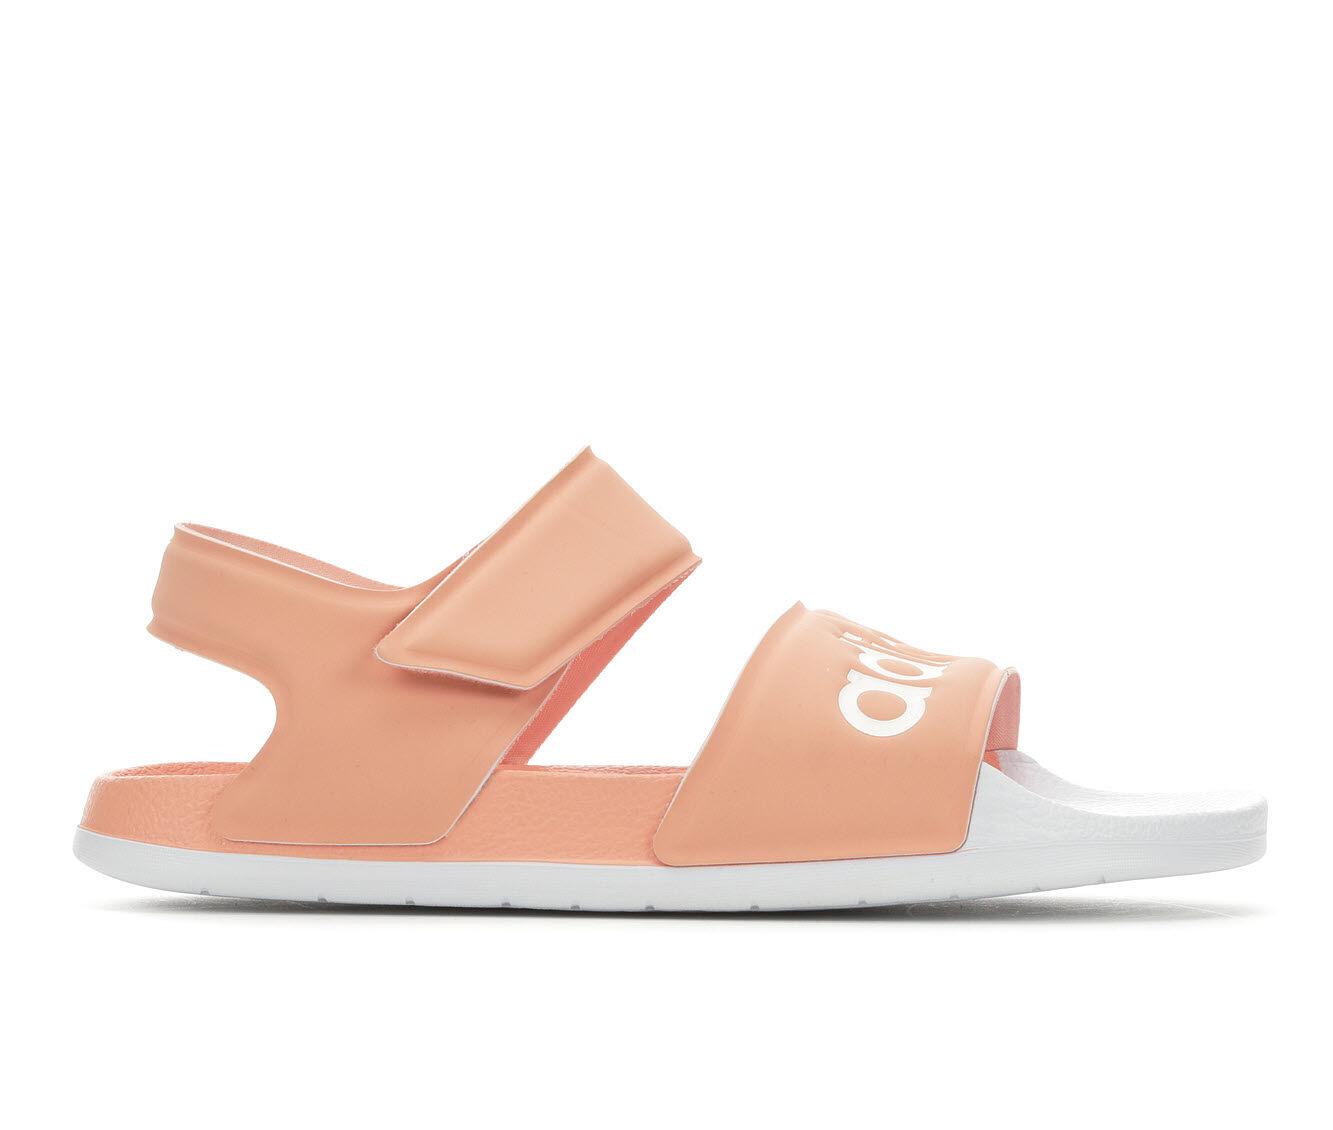 Women's Adidas Adilette Sport Sandals Dust Pink